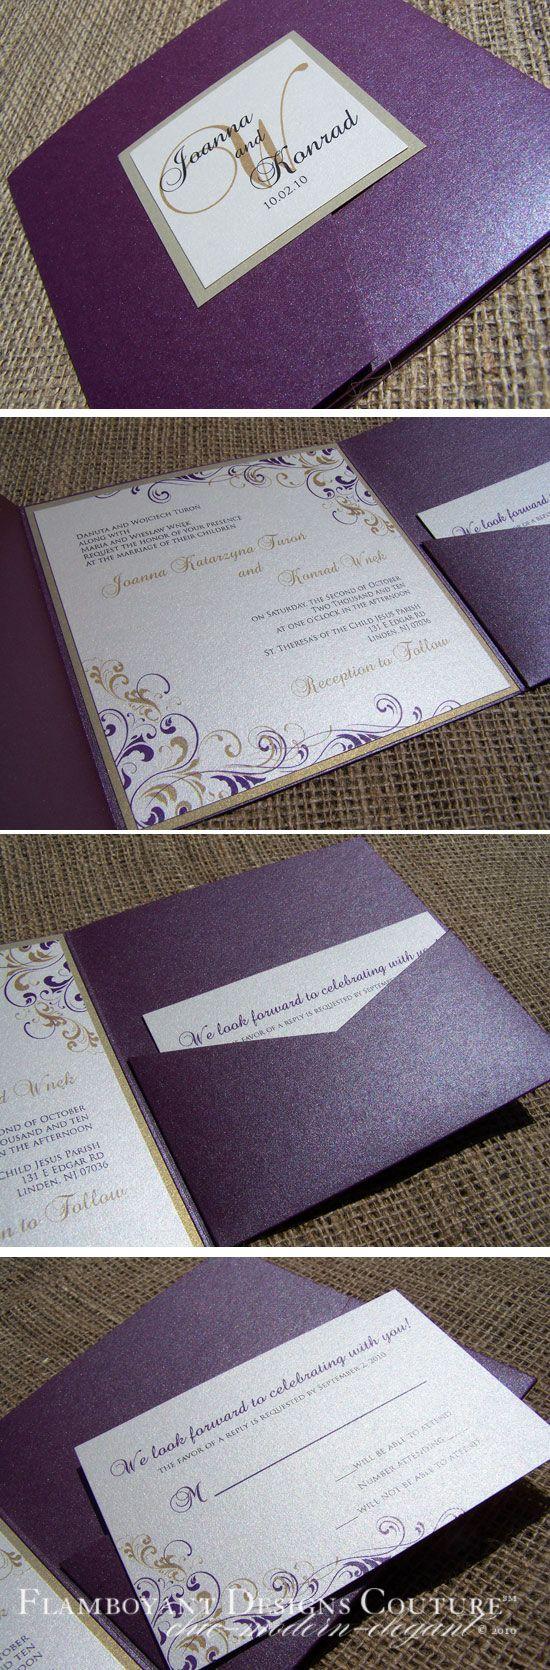 157 Best Wedding Invitations Images On Pinterest Wedding Ideas